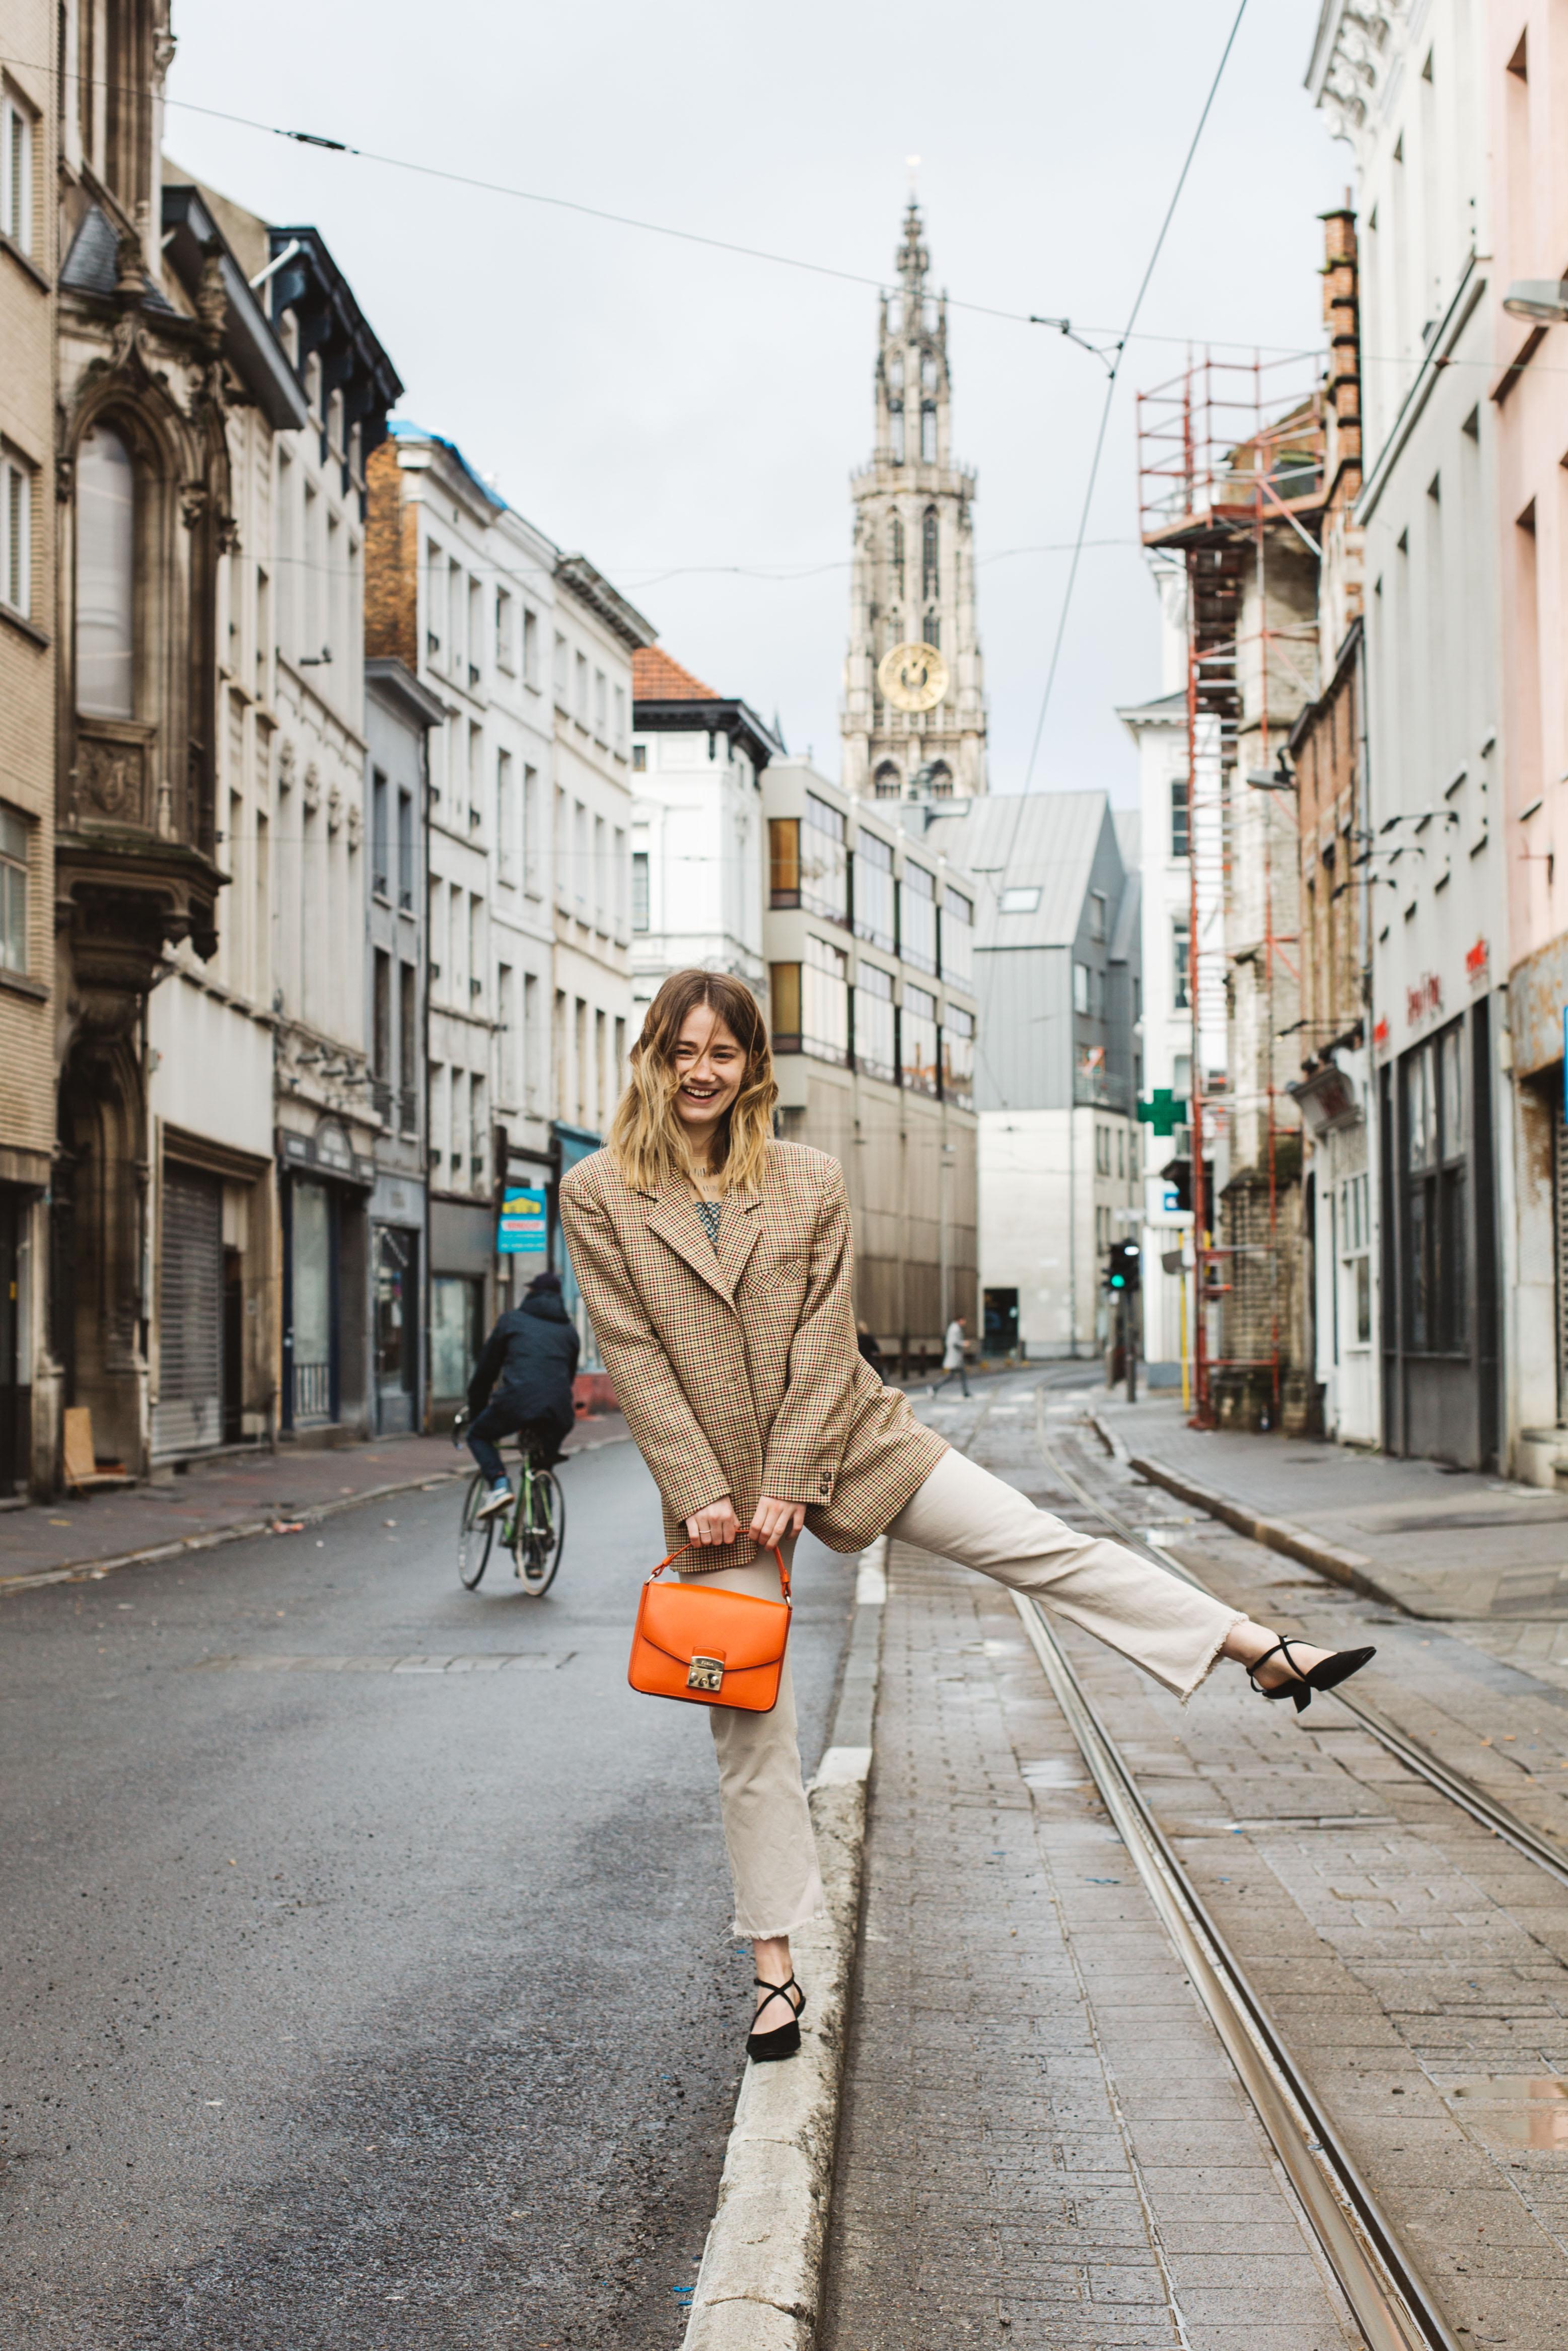 Antwerp, Astrid Nieuwborg, The Next Closet, Iris Duvekot